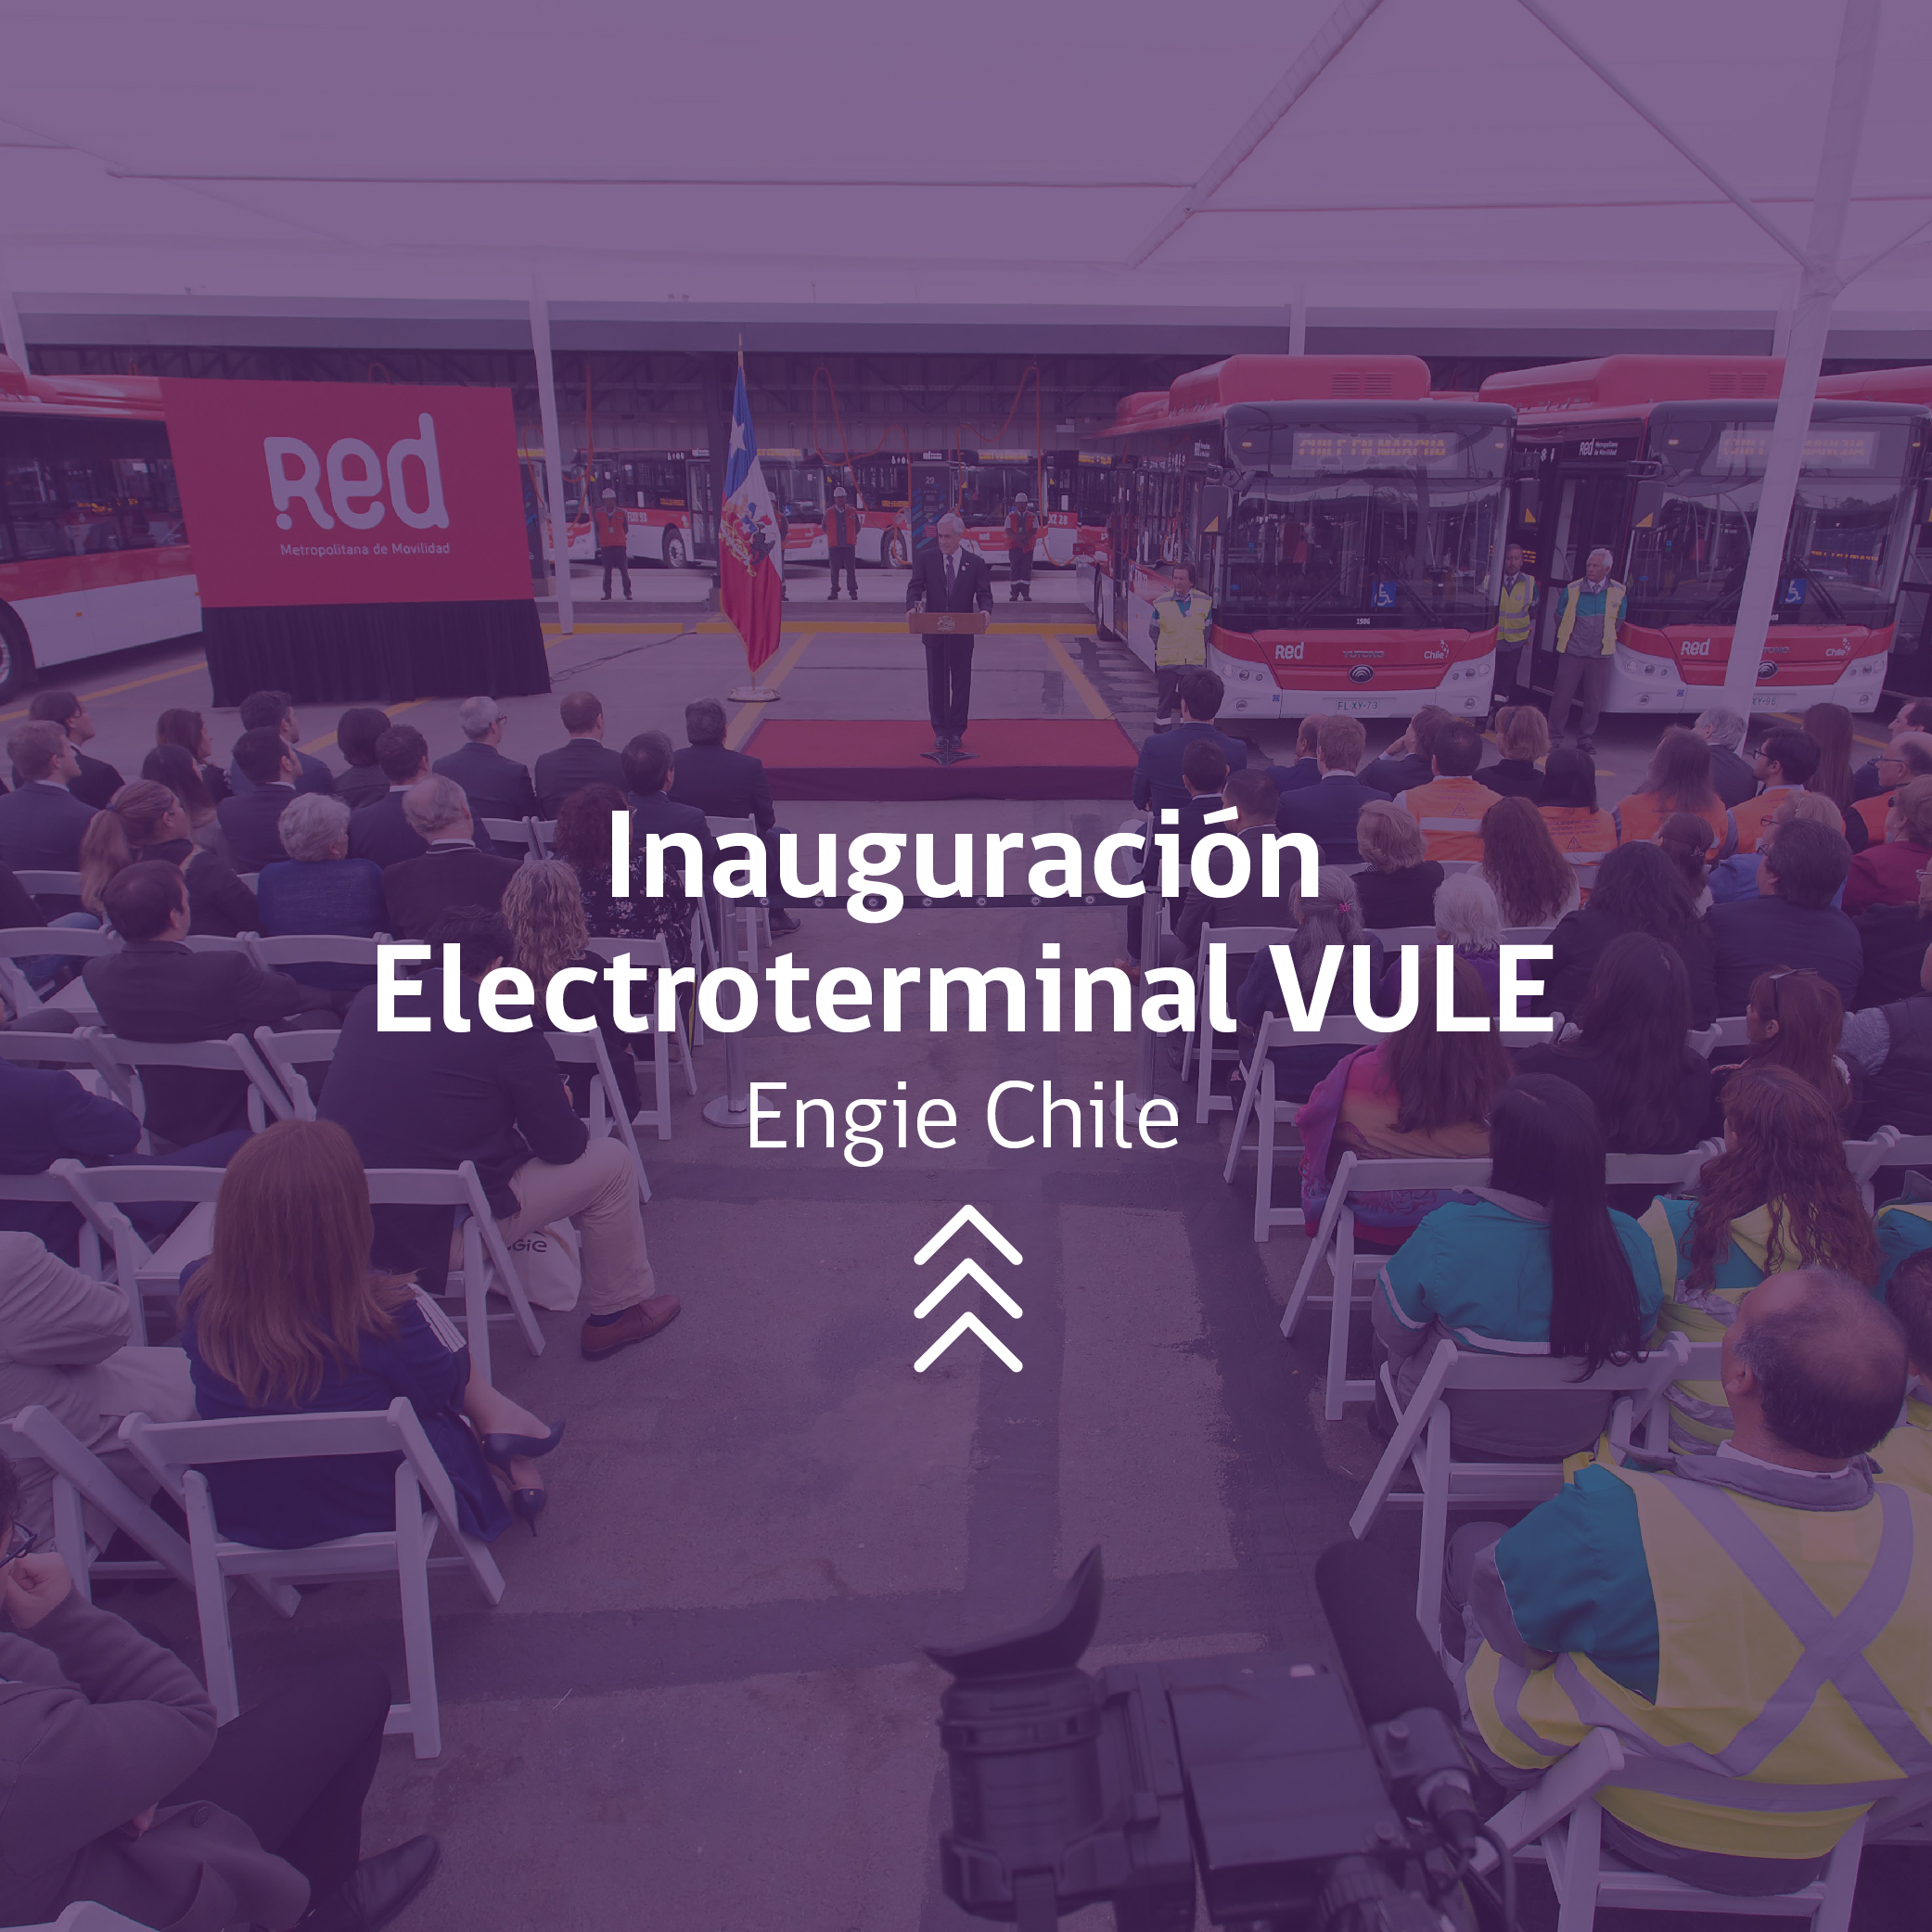 Inauguración Electroterminal VULE Eventos ENGIE Chile